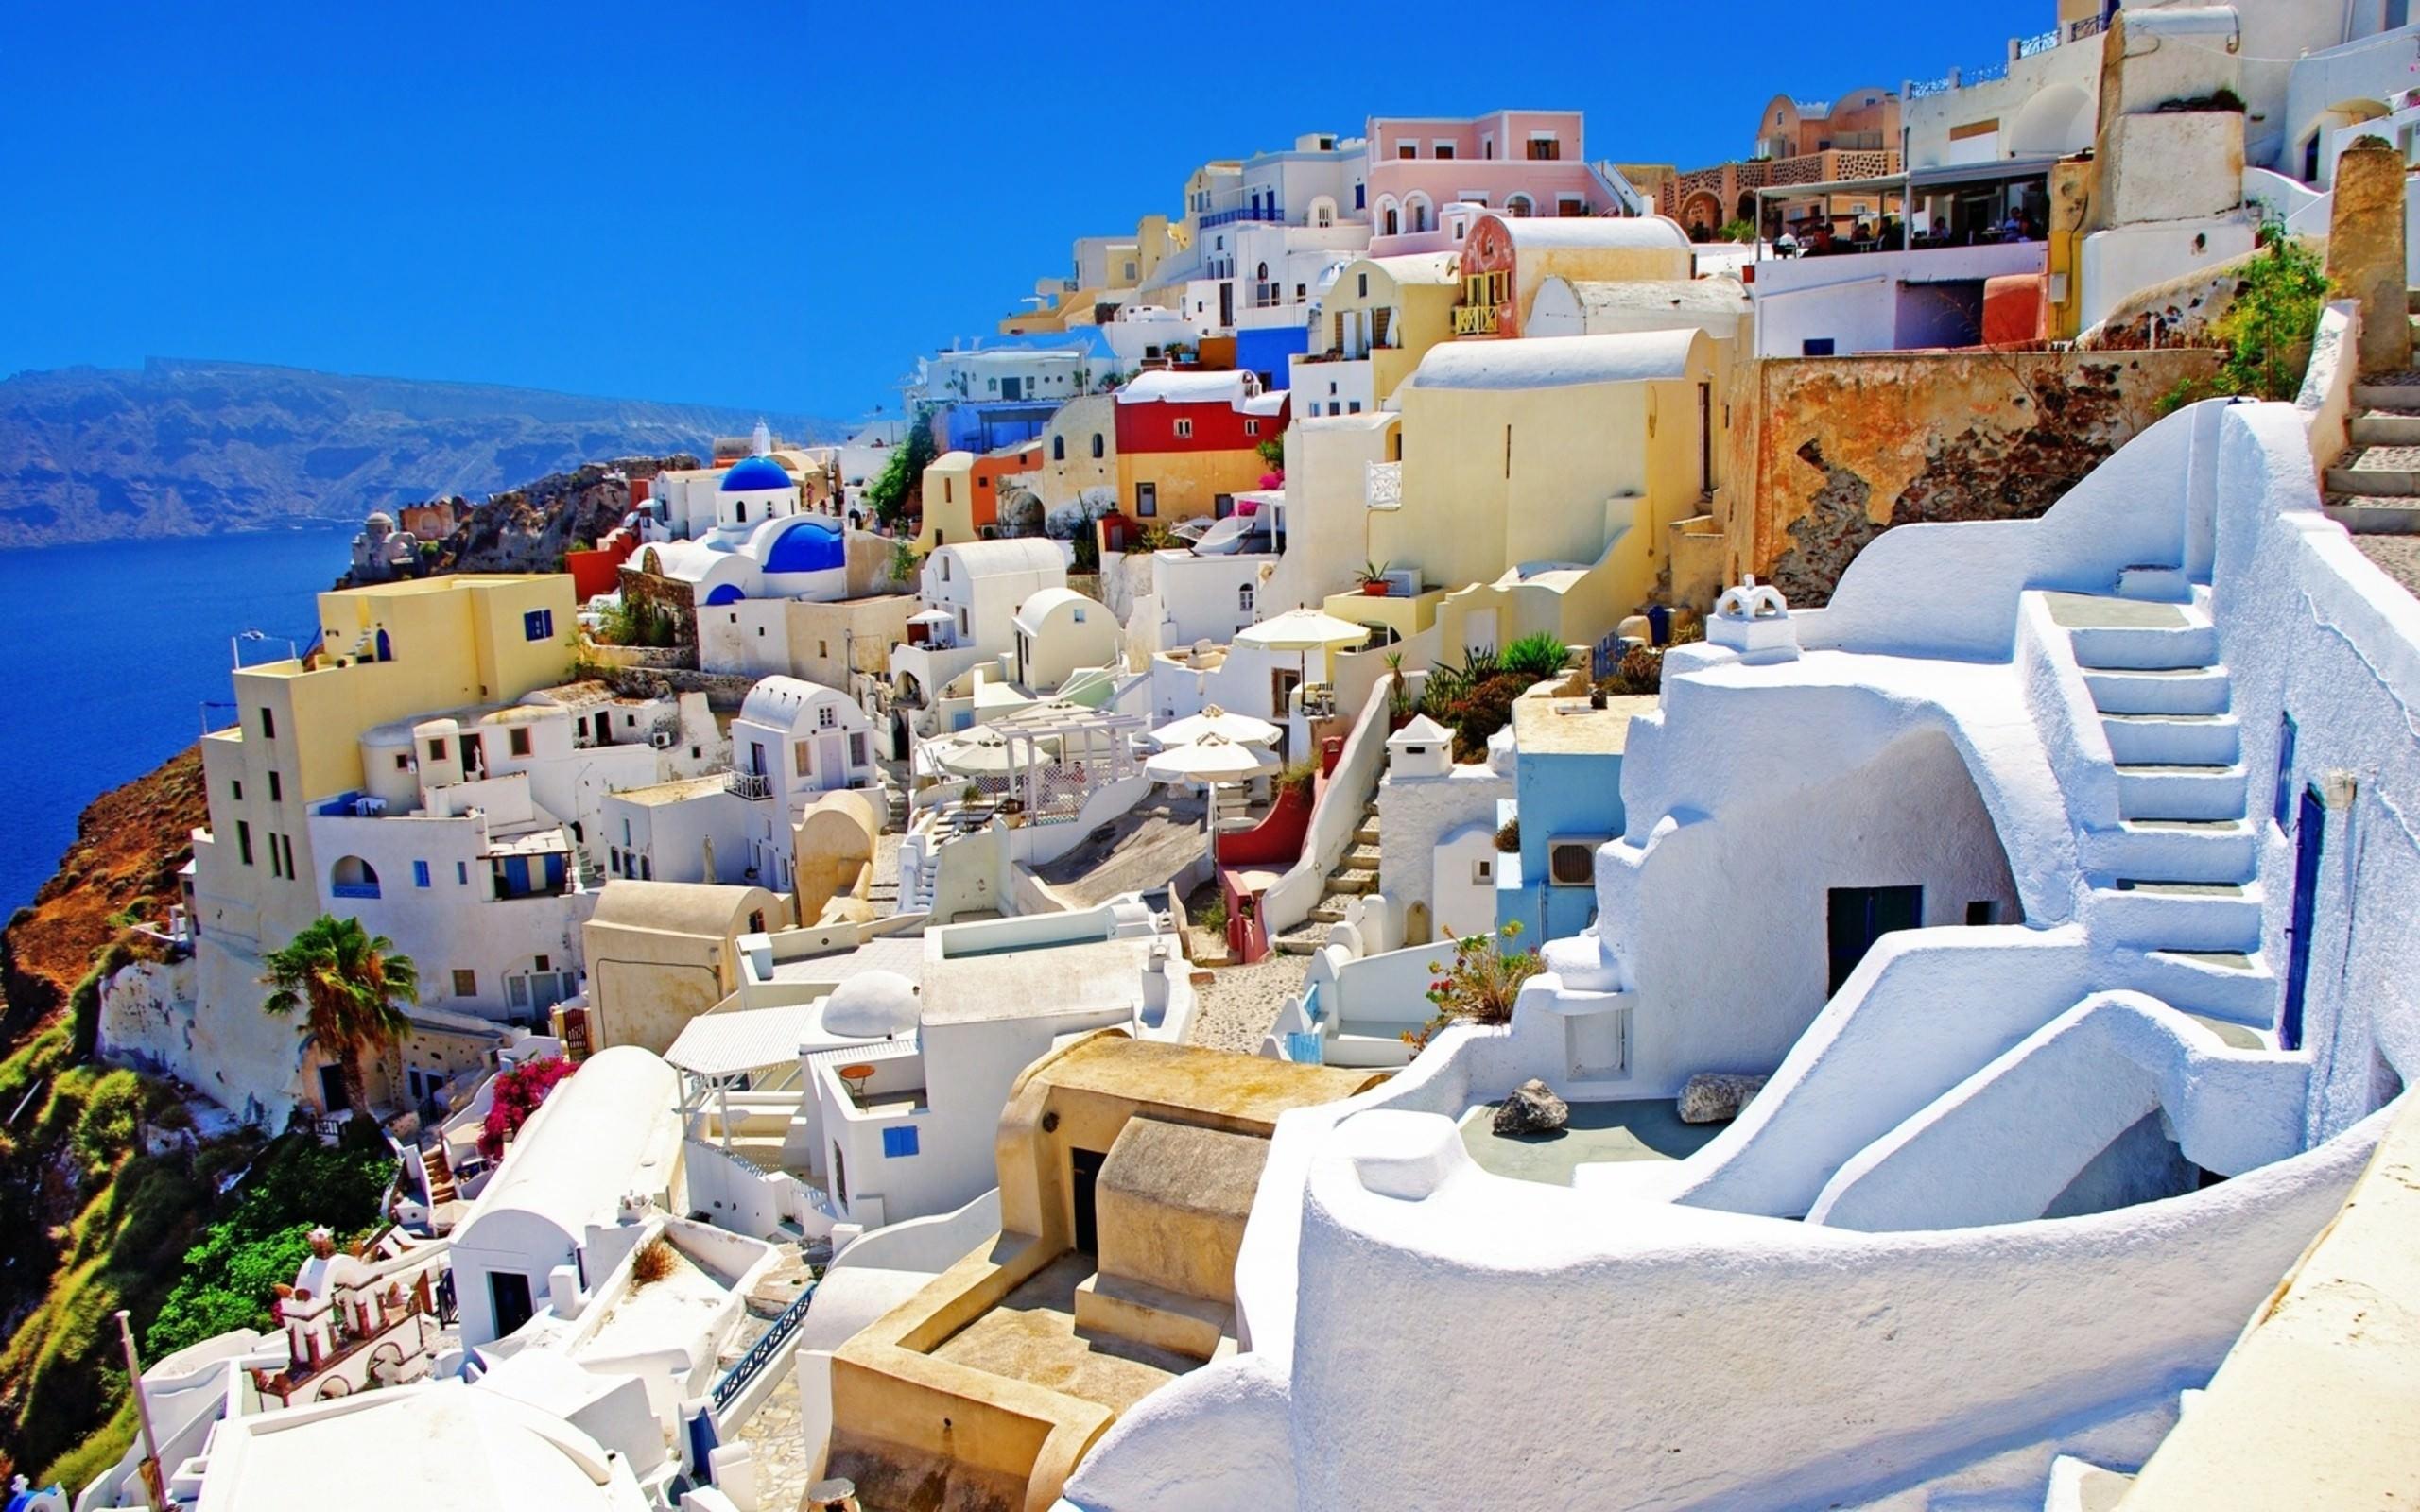 santorini greece cityscape